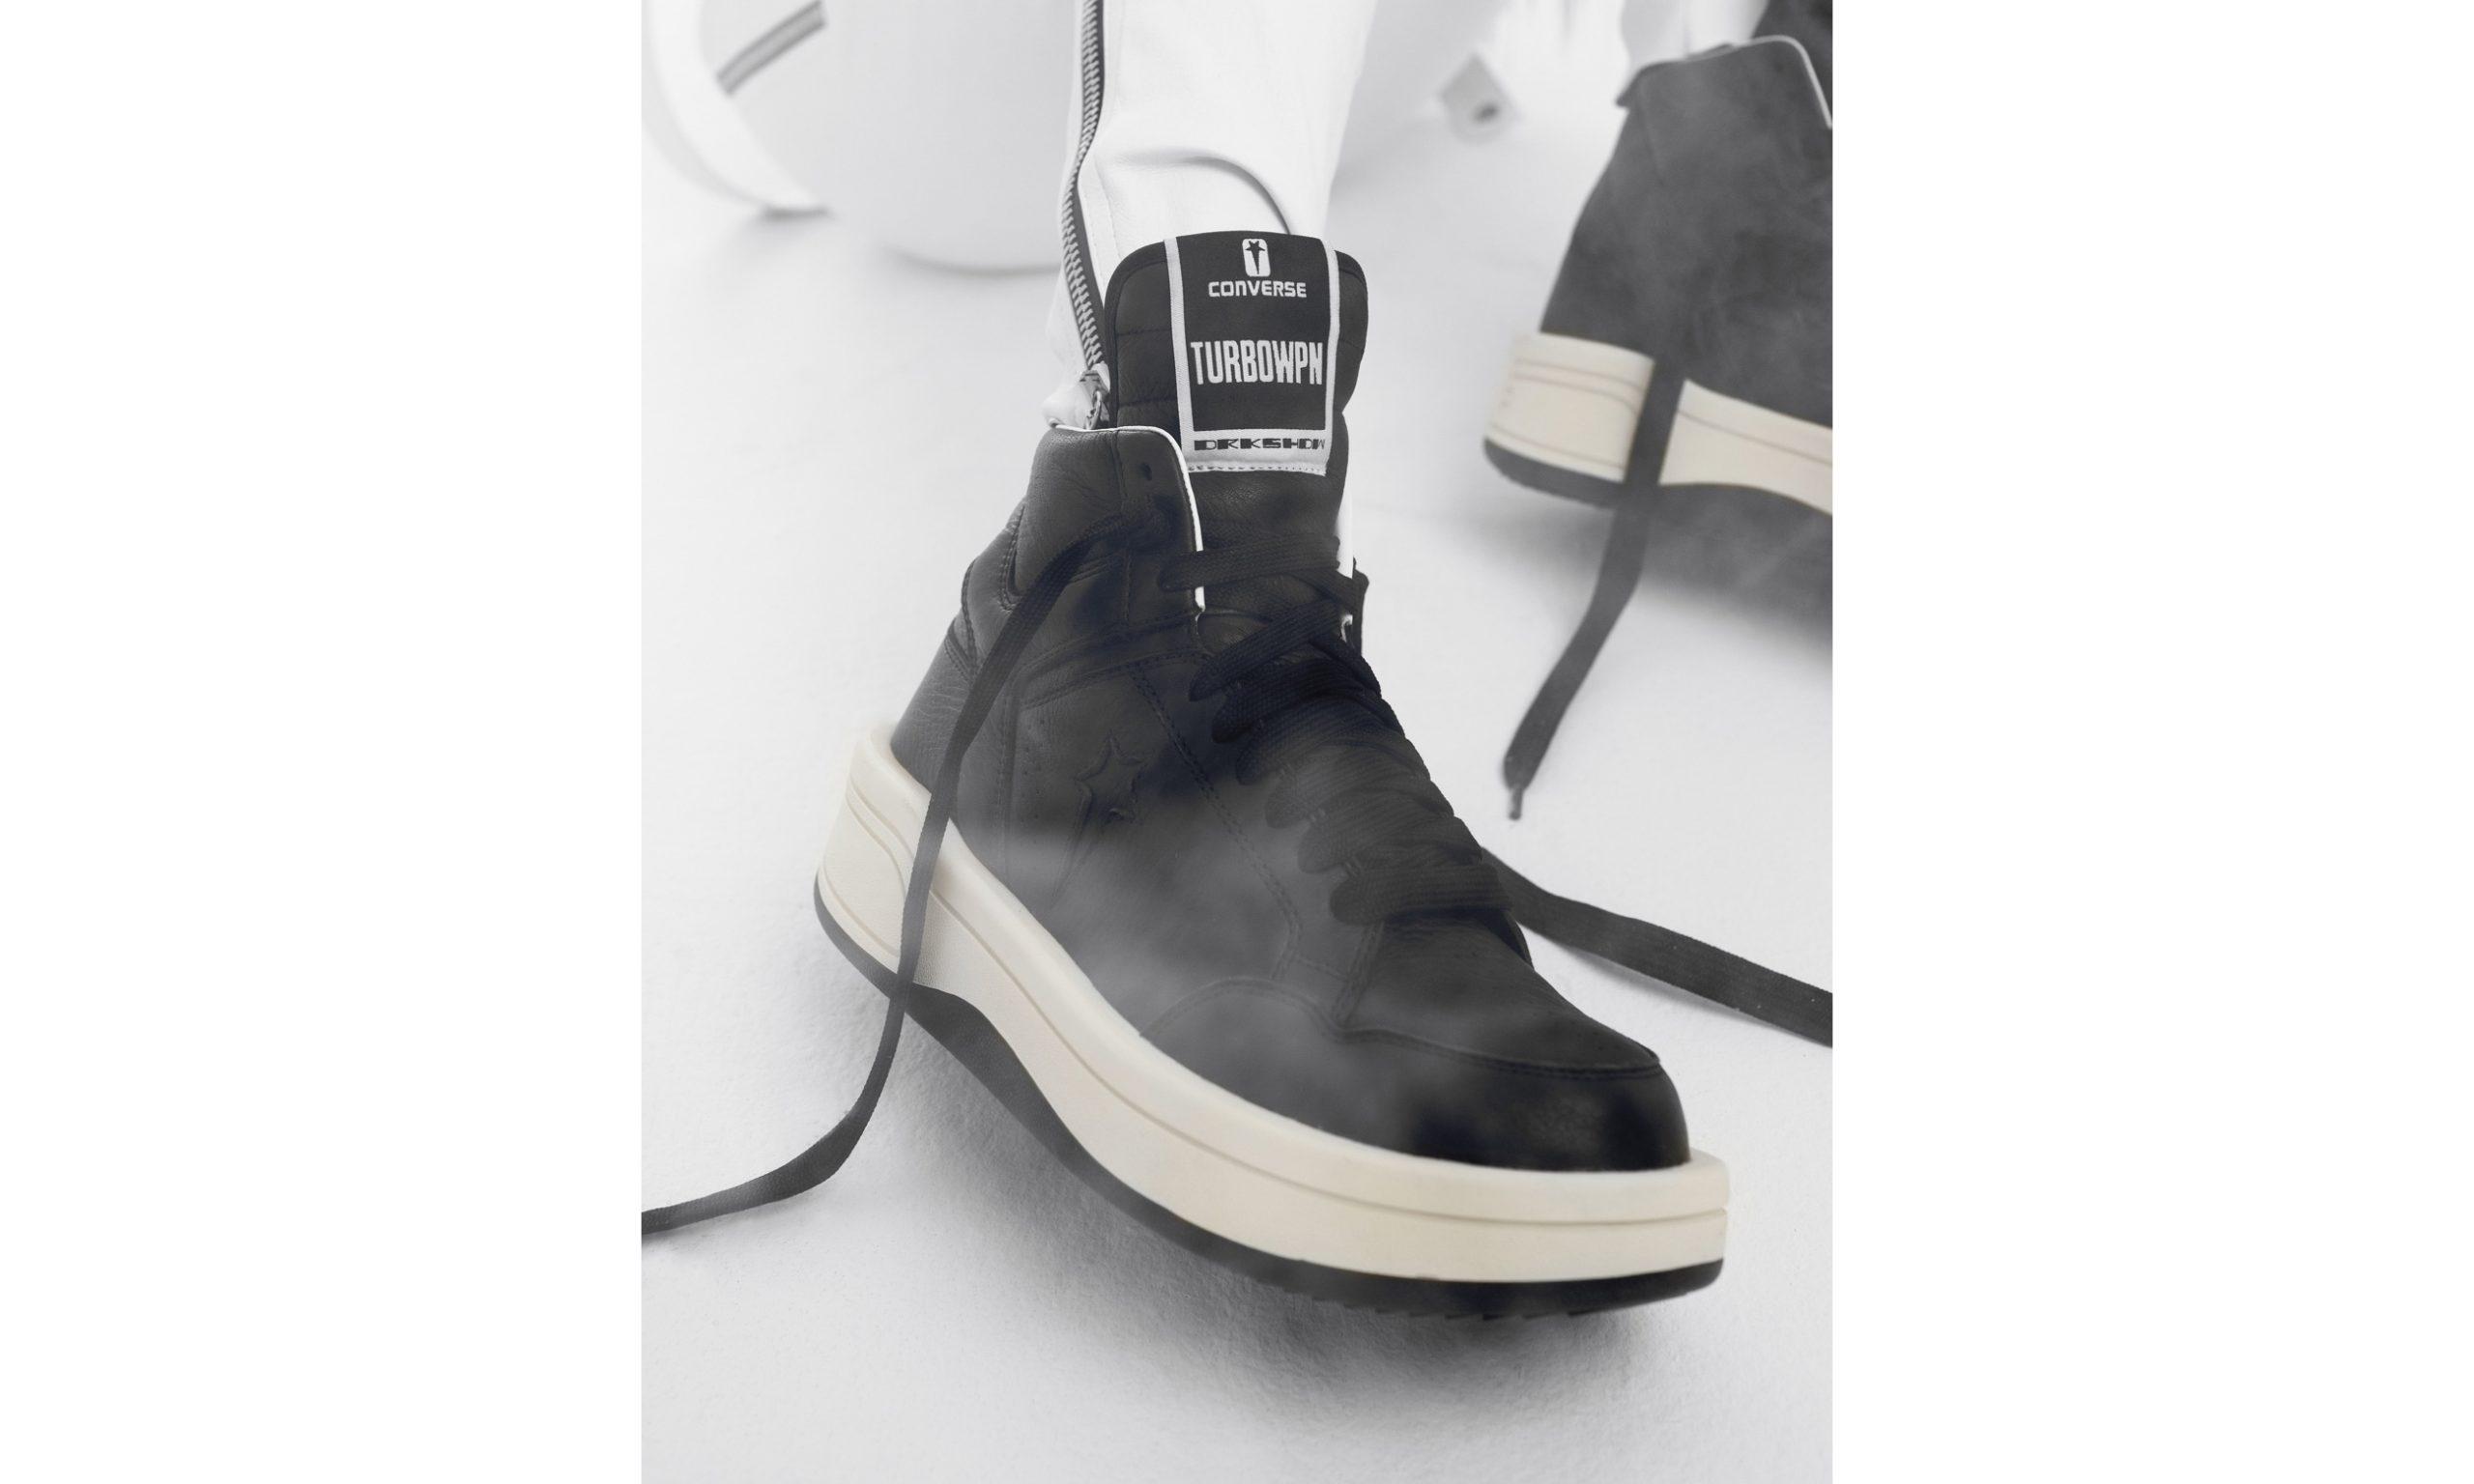 DRKSHDW x CONVERSE 全新联名 TURBOWPN 鞋款登场